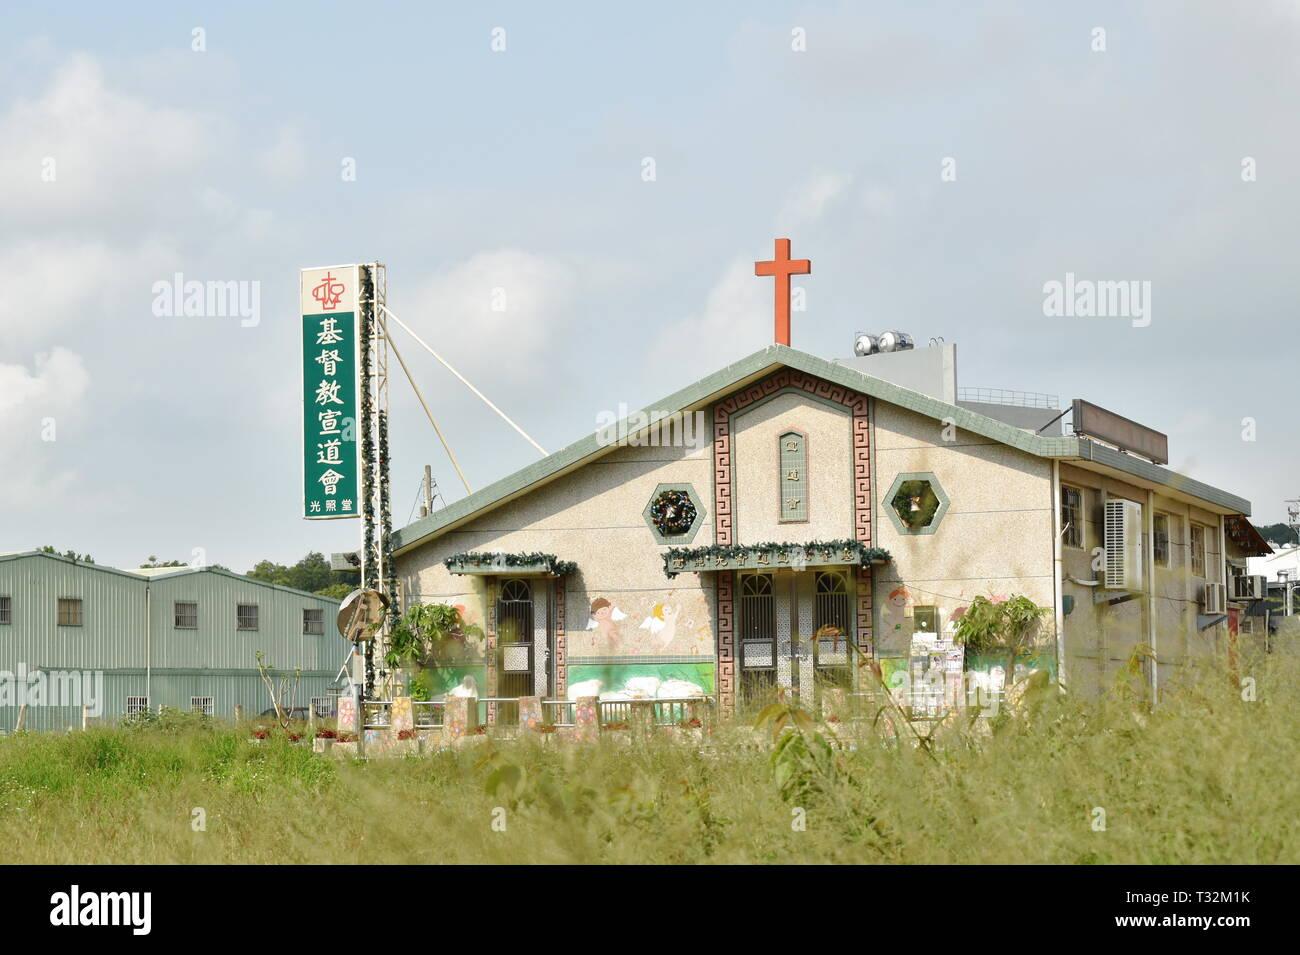 Taichung Taiwan March 29, 2019 : Christian church on grass field near rainbow village - Stock Image